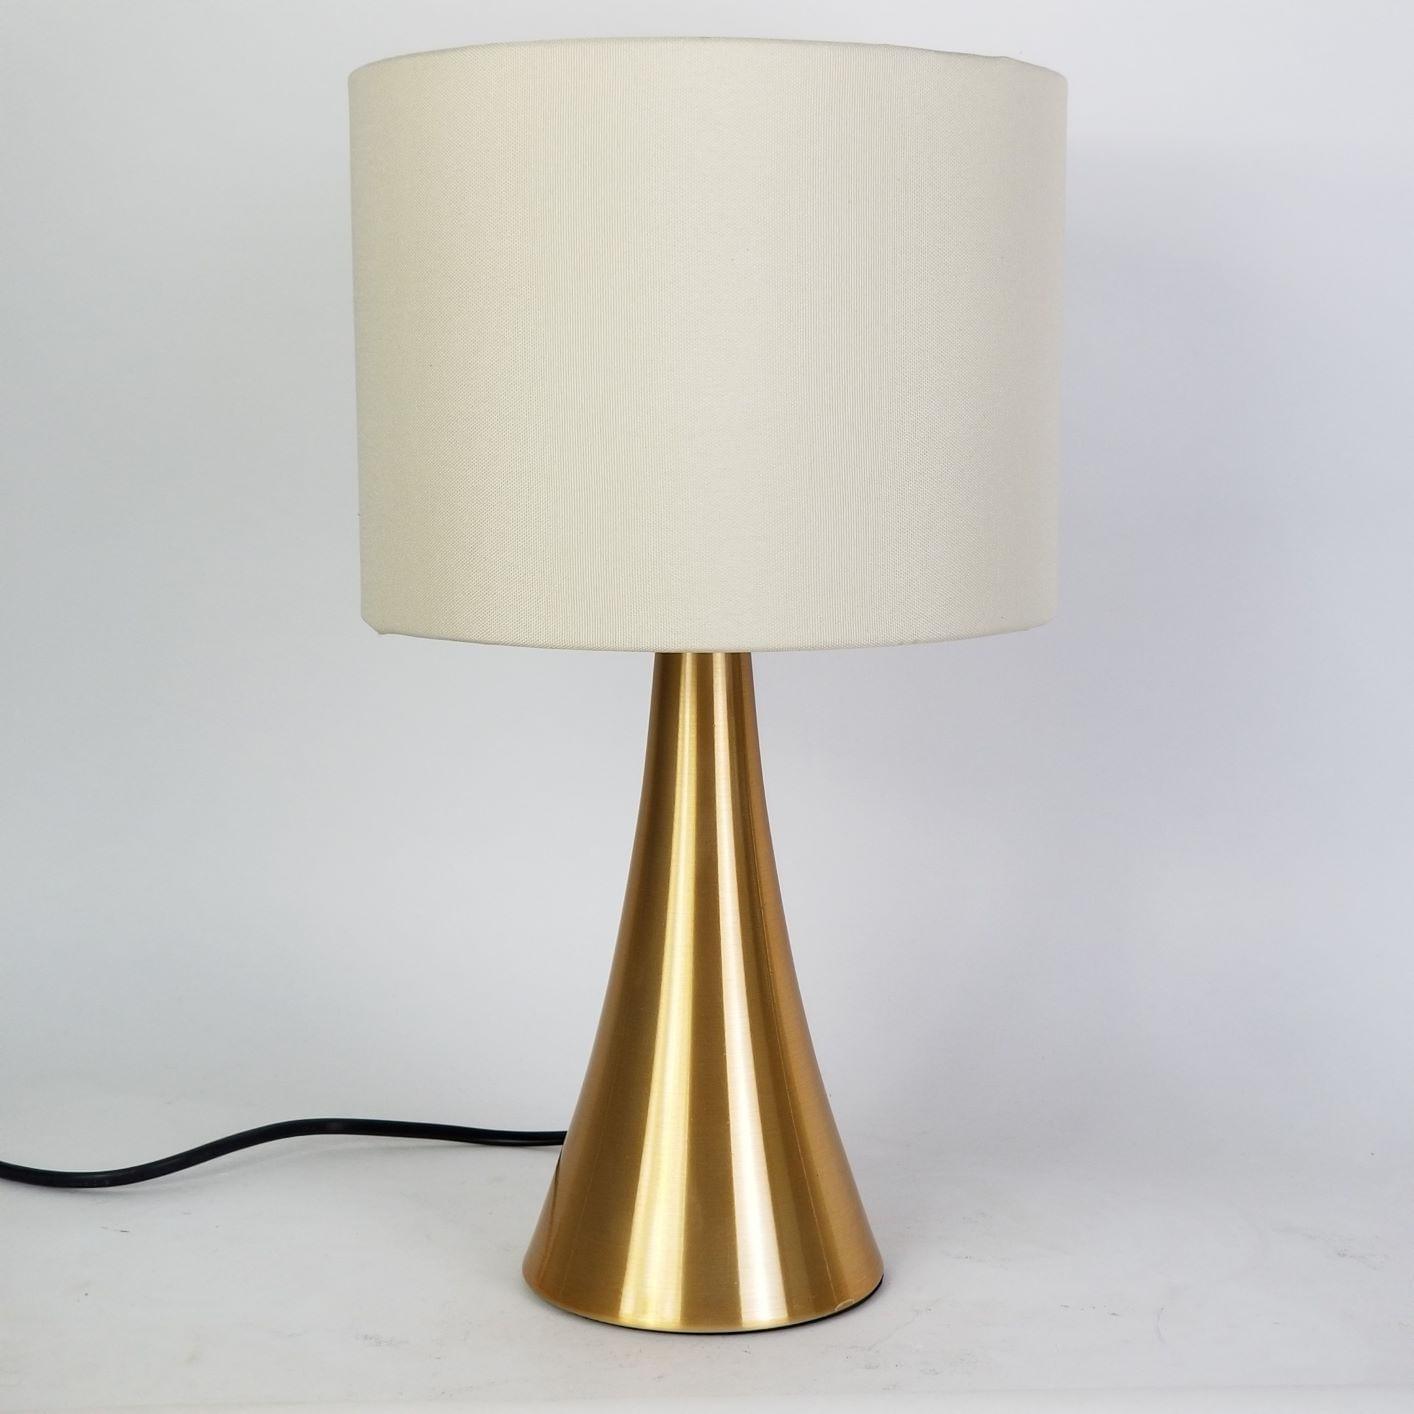 Kit 2 Abajures de Alumínio Dourado Cúpula Bege Palha